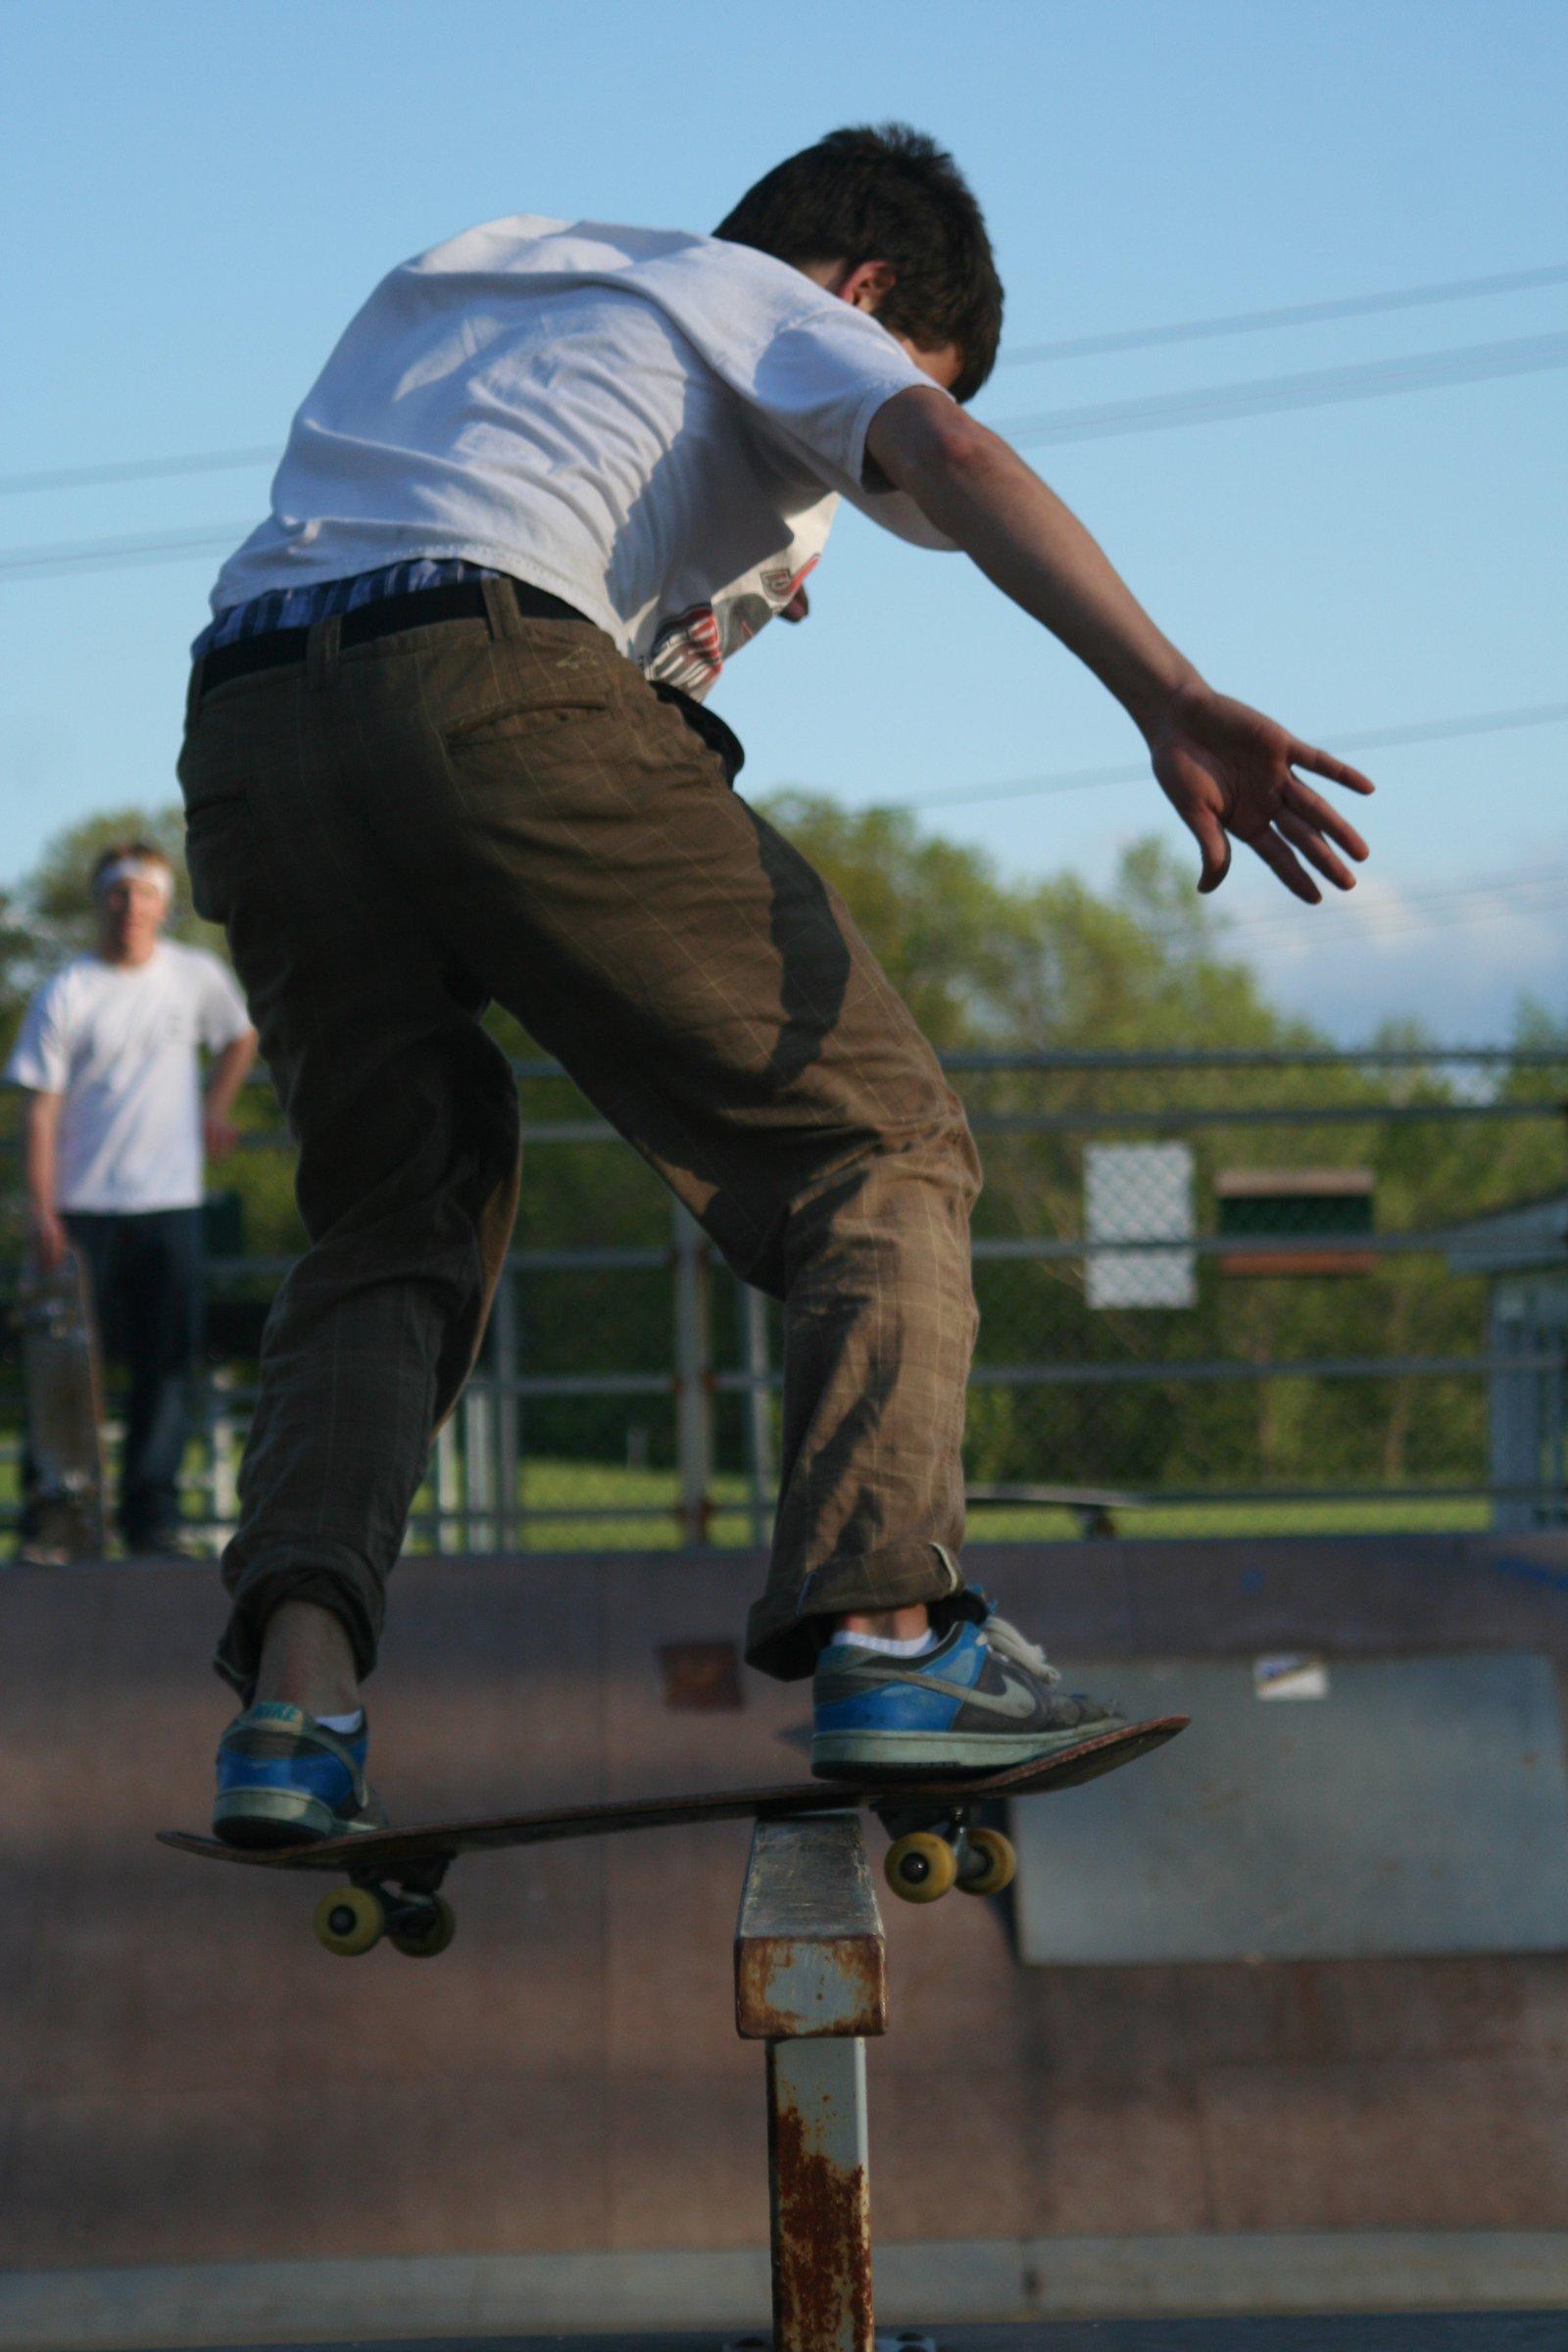 Flatbar boardslide